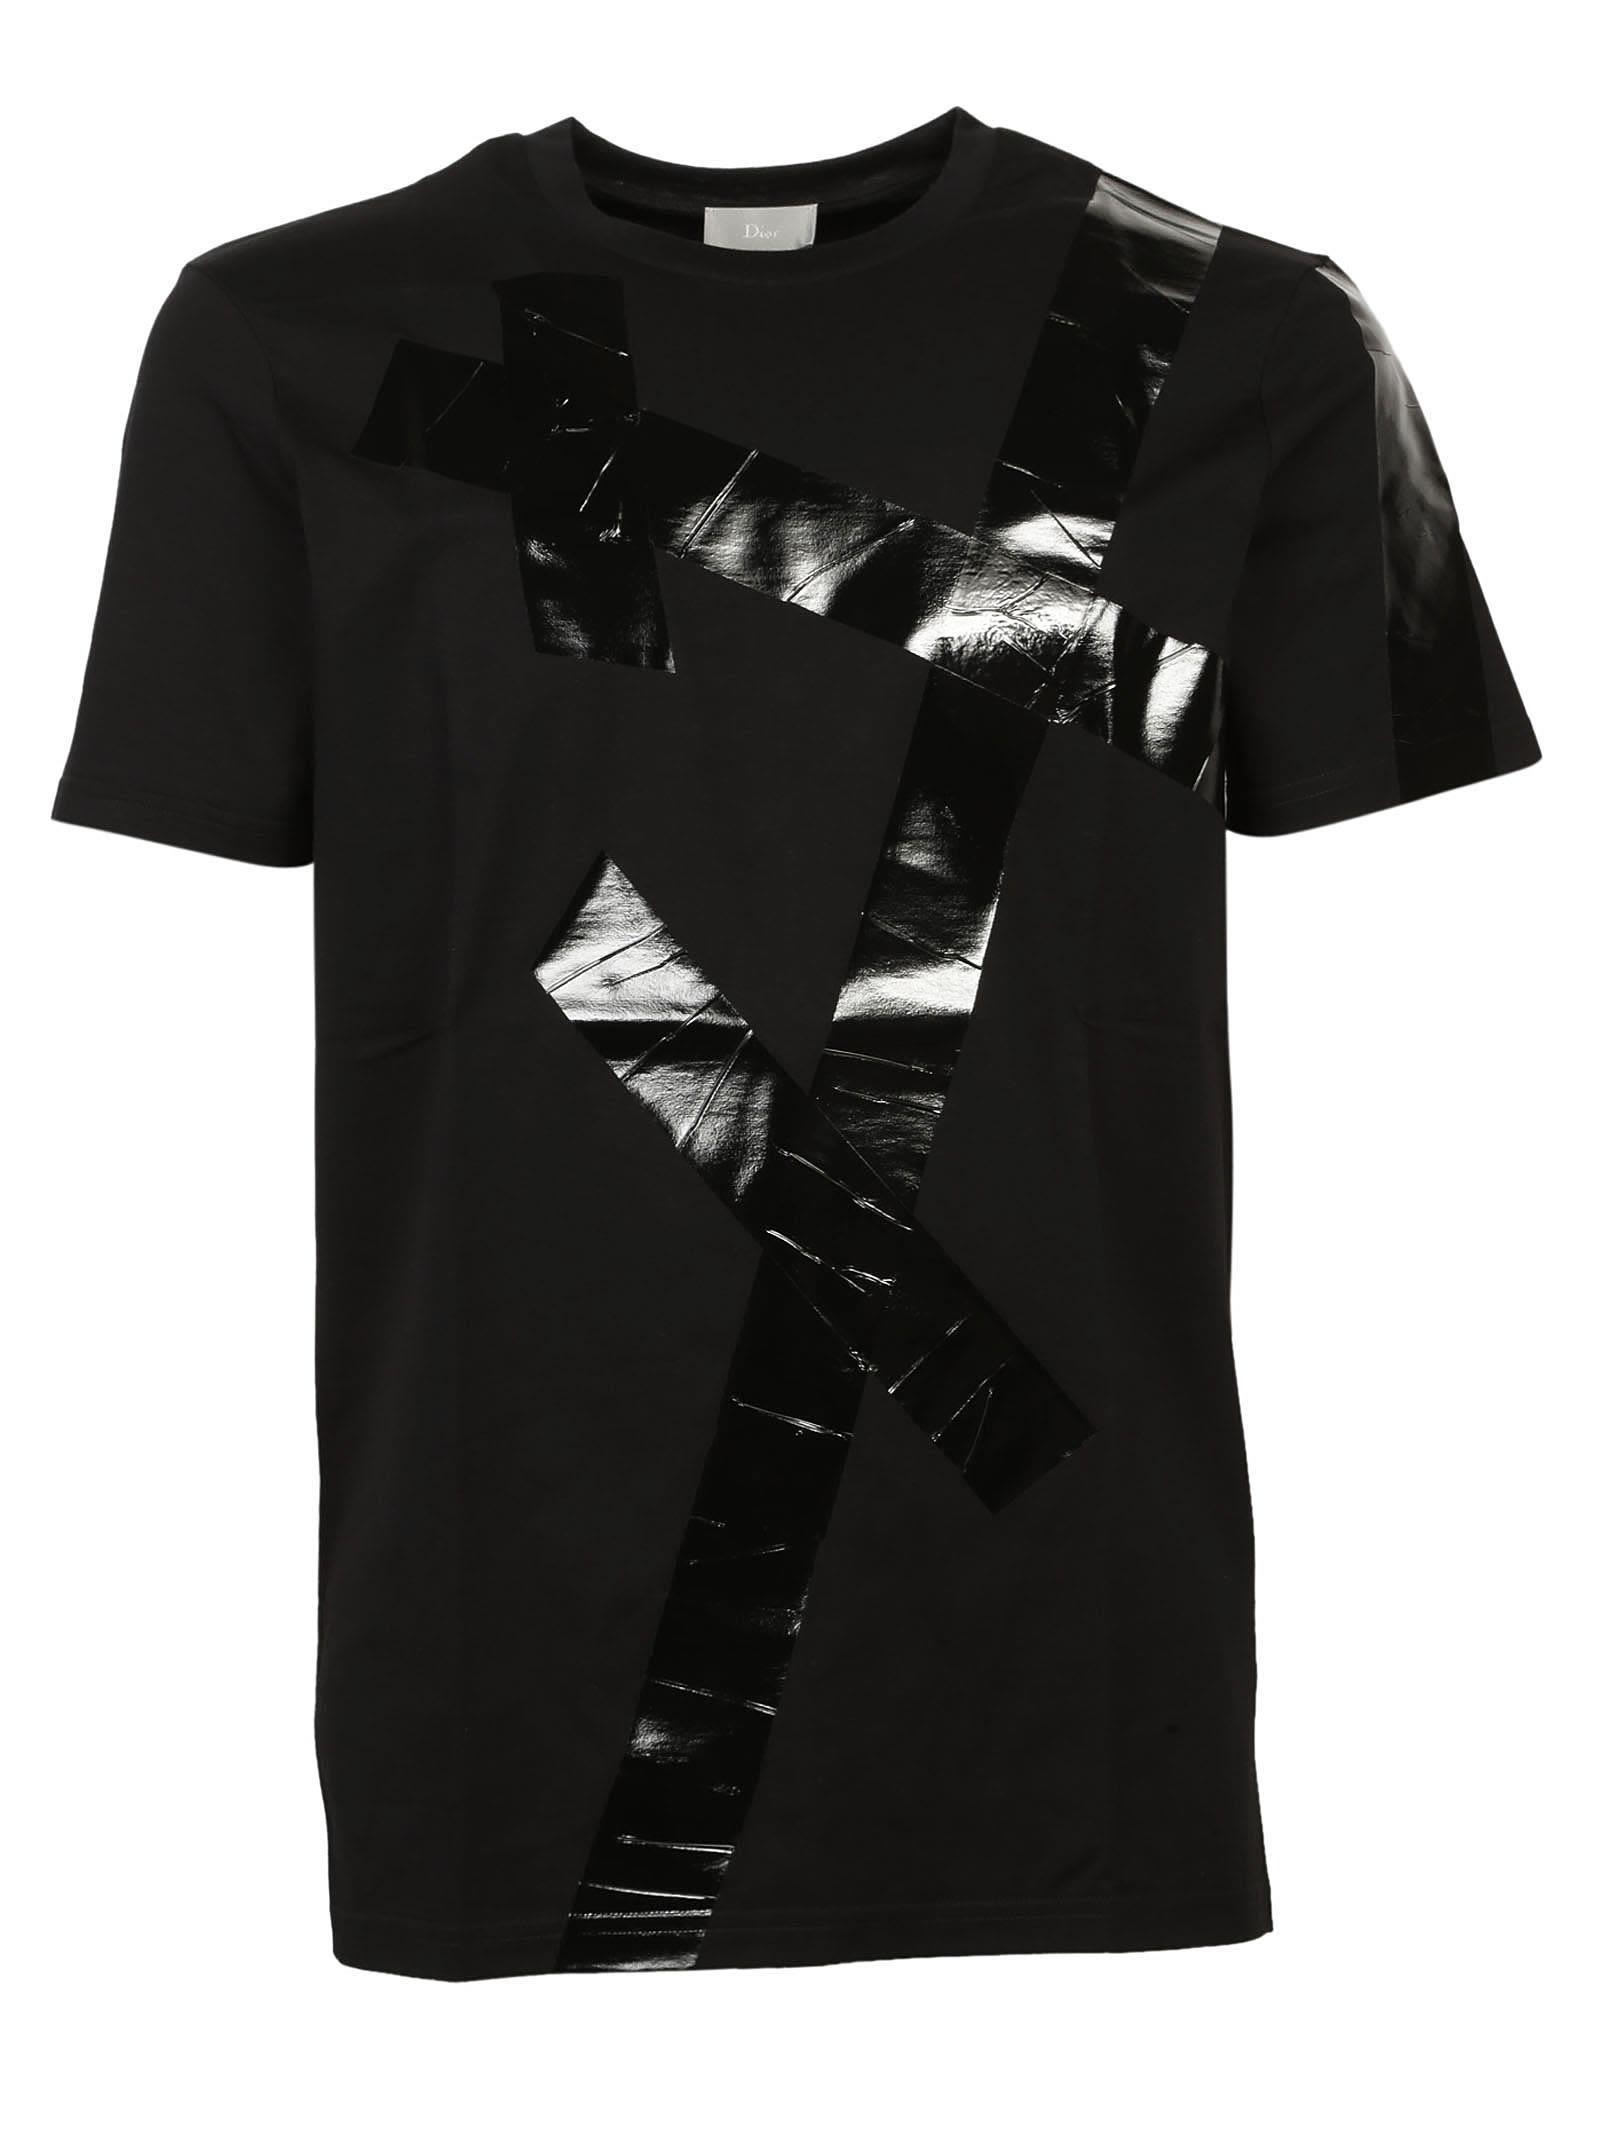 Christian Dior Banded T-shirt